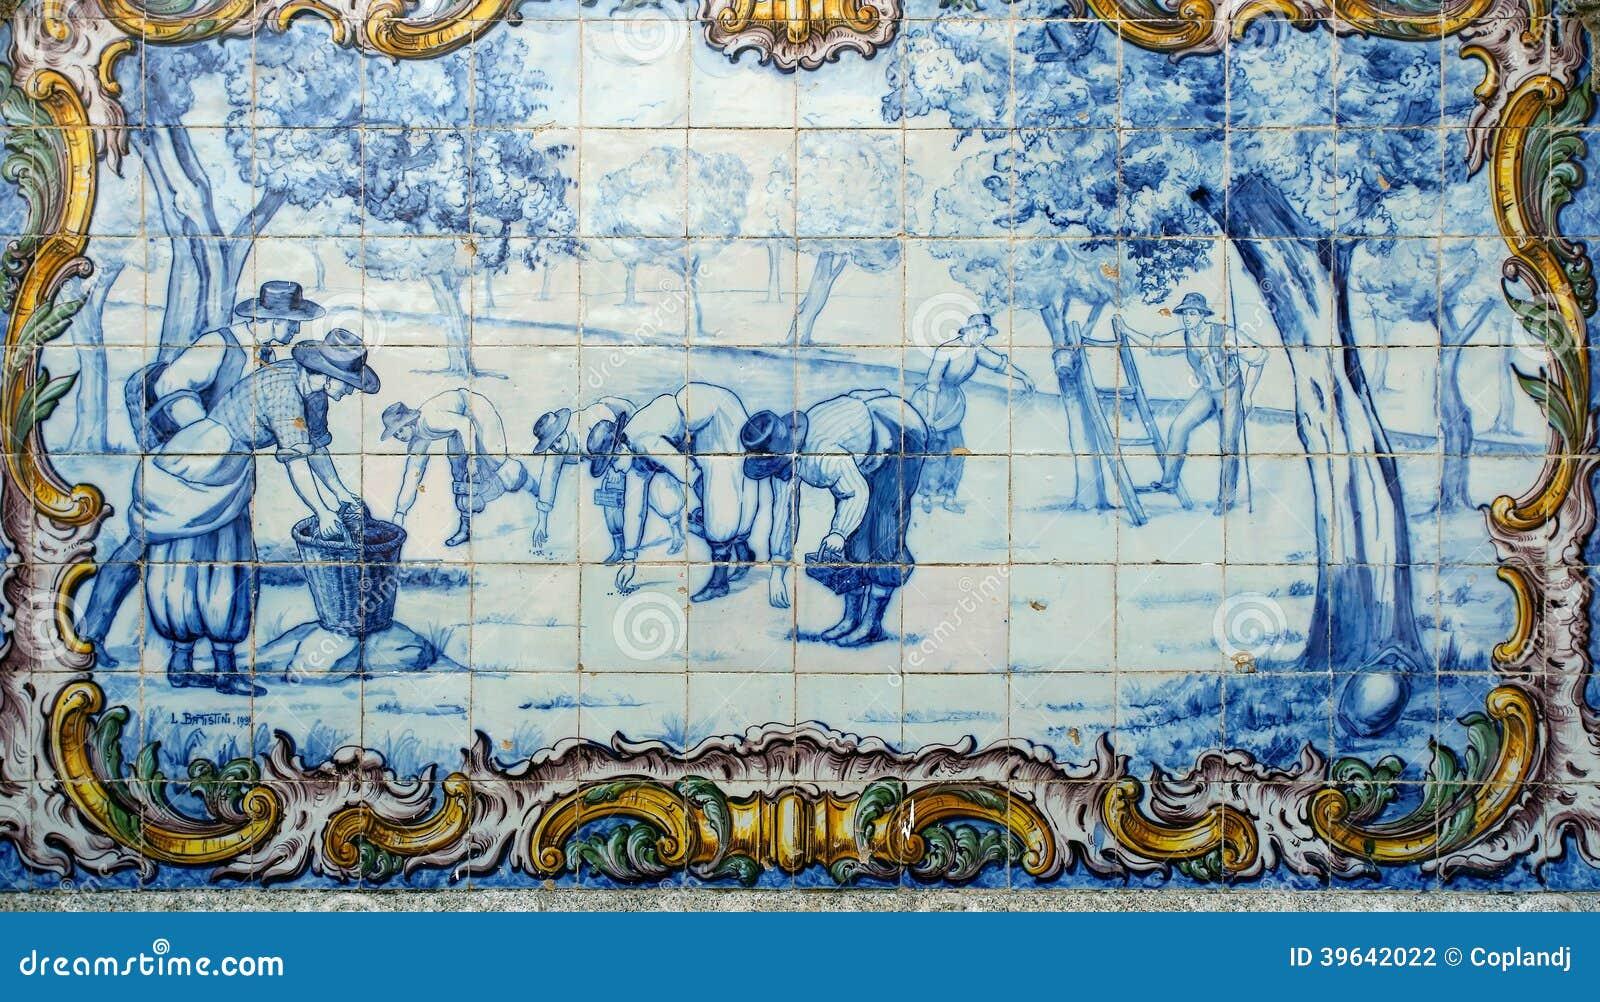 Portugal azulejos hist ricos de azulejo foto de stock for Azulejos de portugal